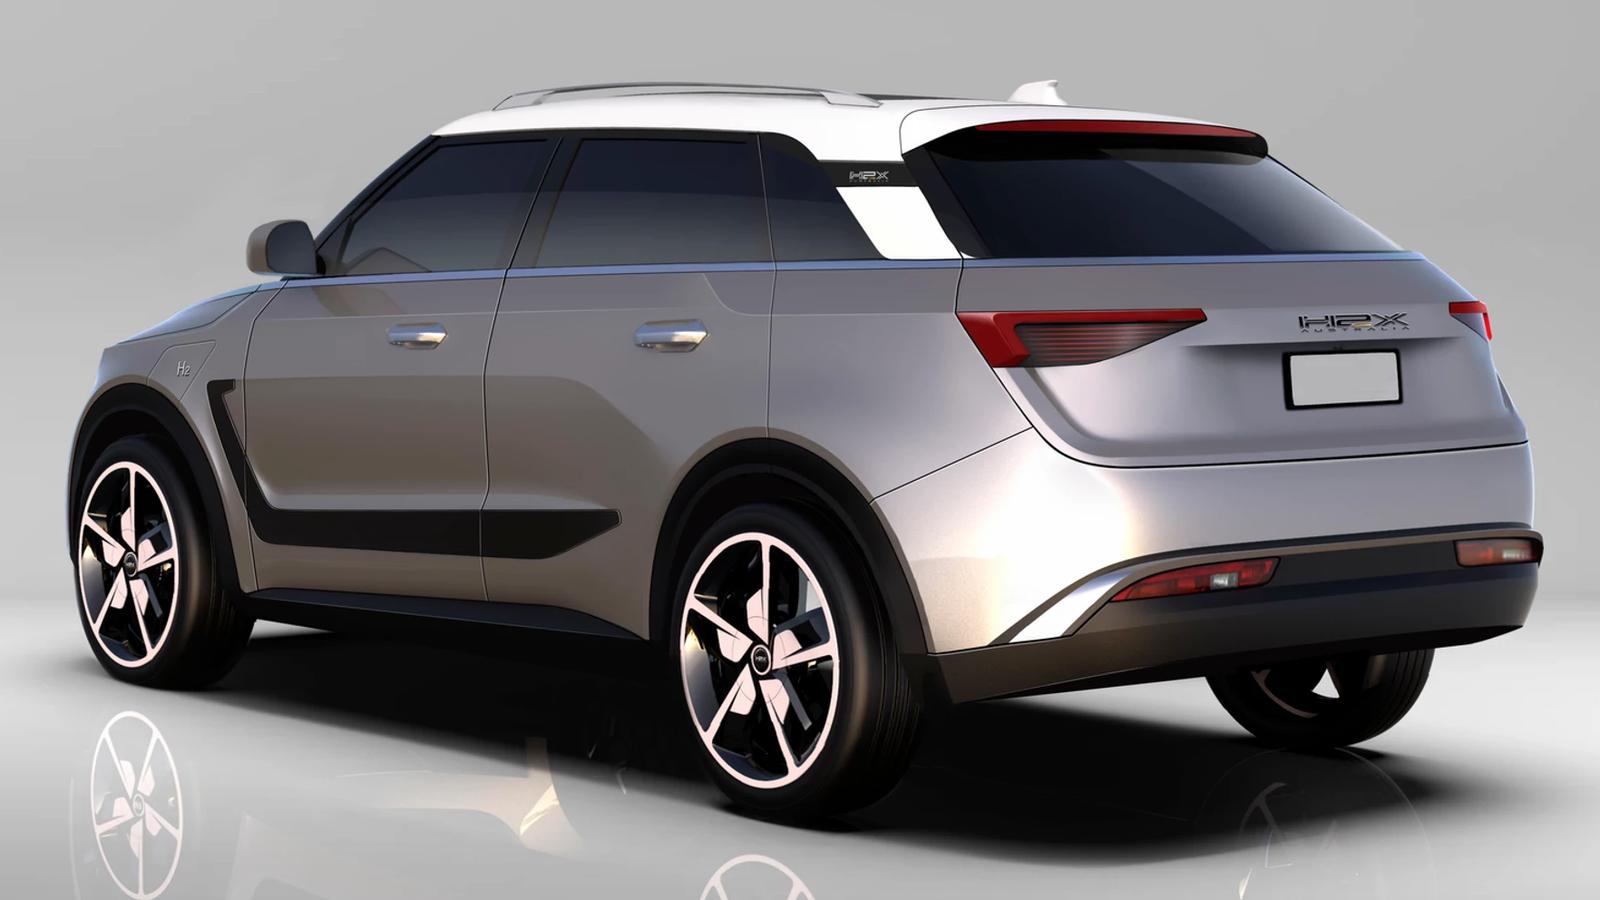 H2X Snowy 2022 модельного года